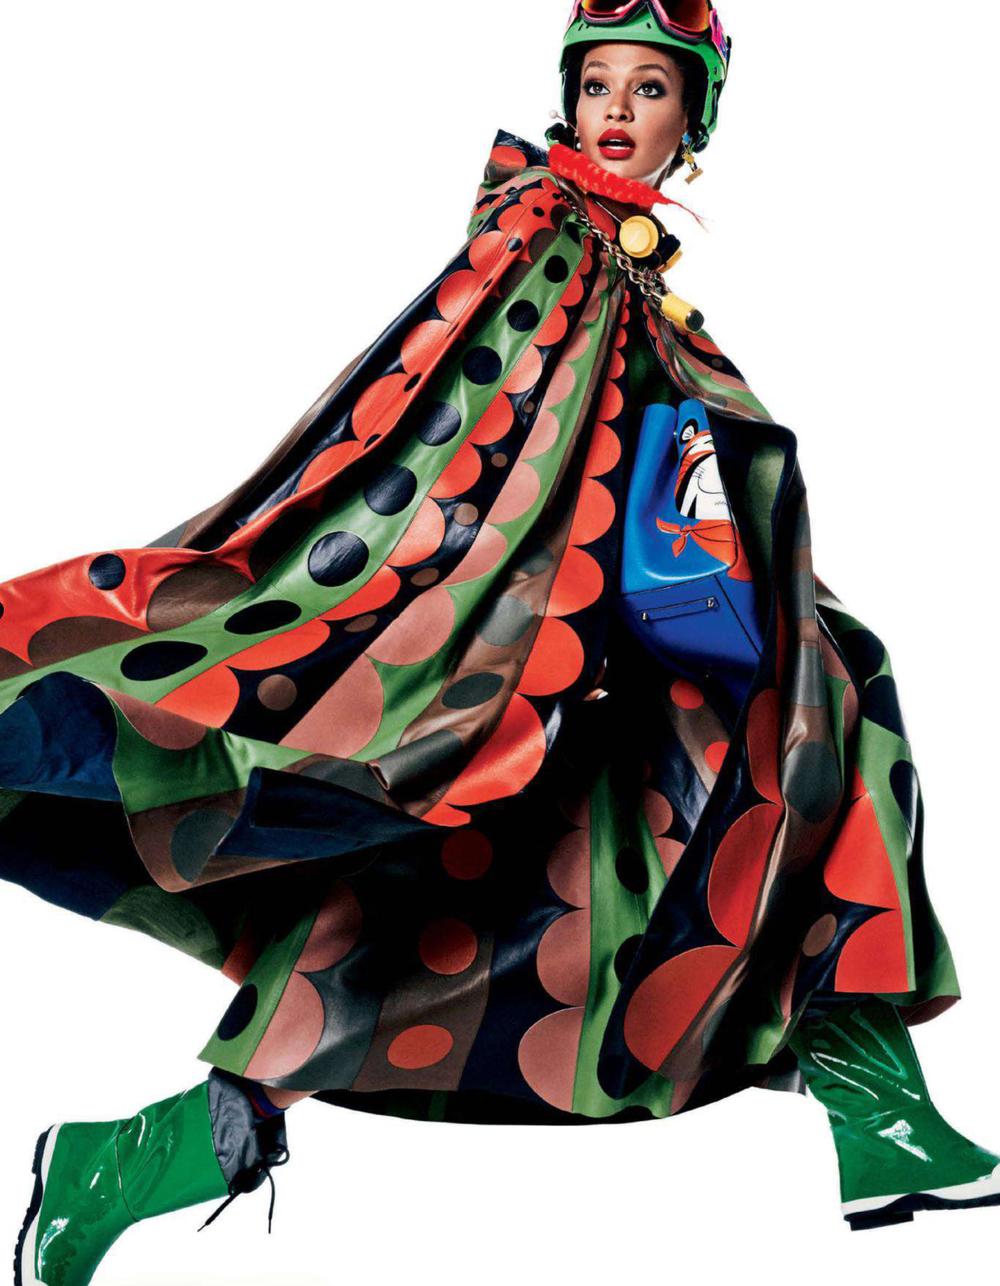 Giampaolo-Sgura-Joan-Smalls-Vogue-Japan-December-2014-2.jpg